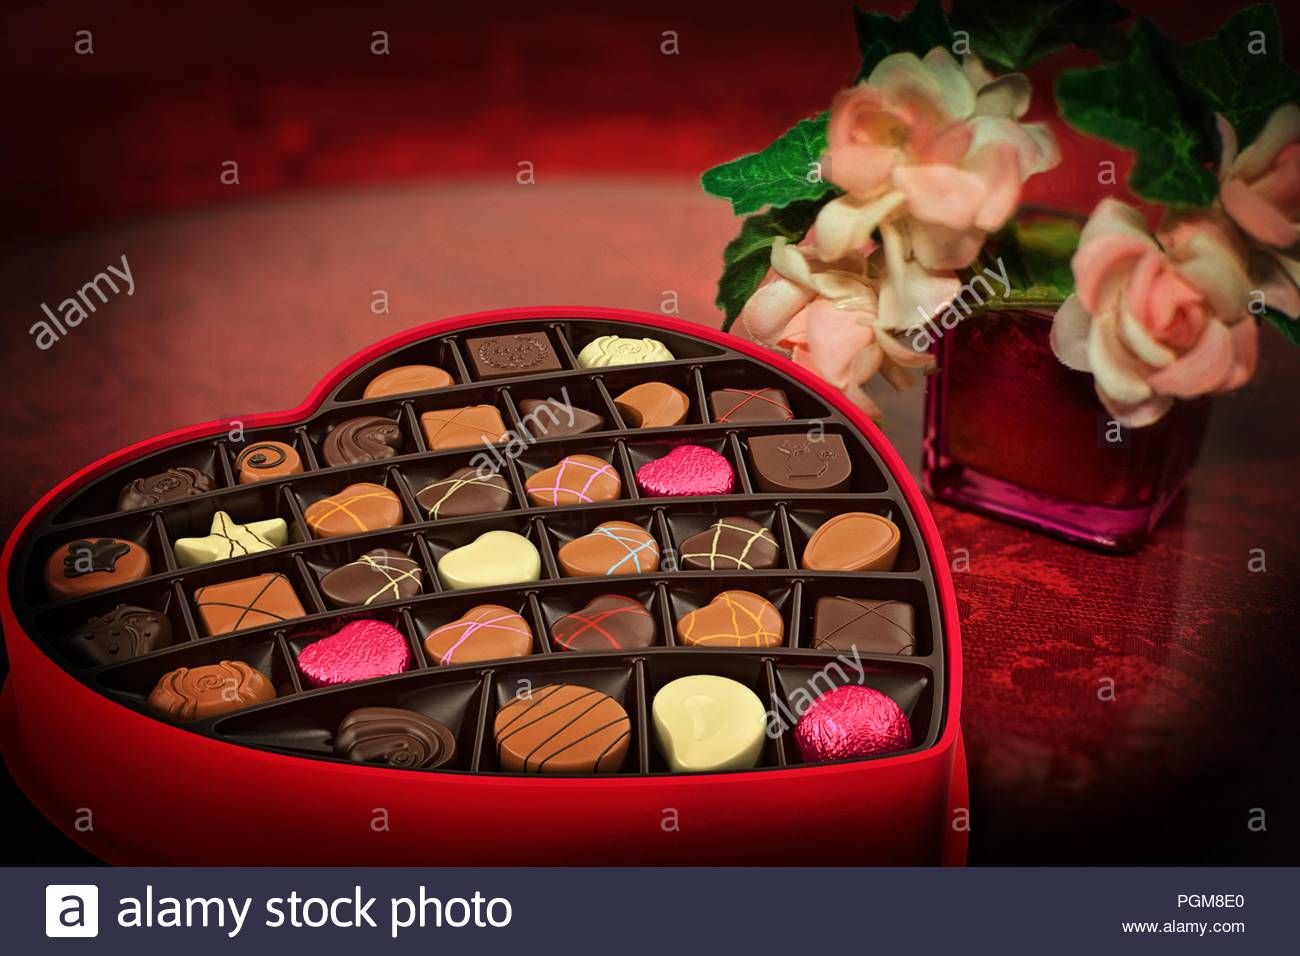 Heart Shaped Chocolate Box Alcohol Surprise Love Couple Romantic